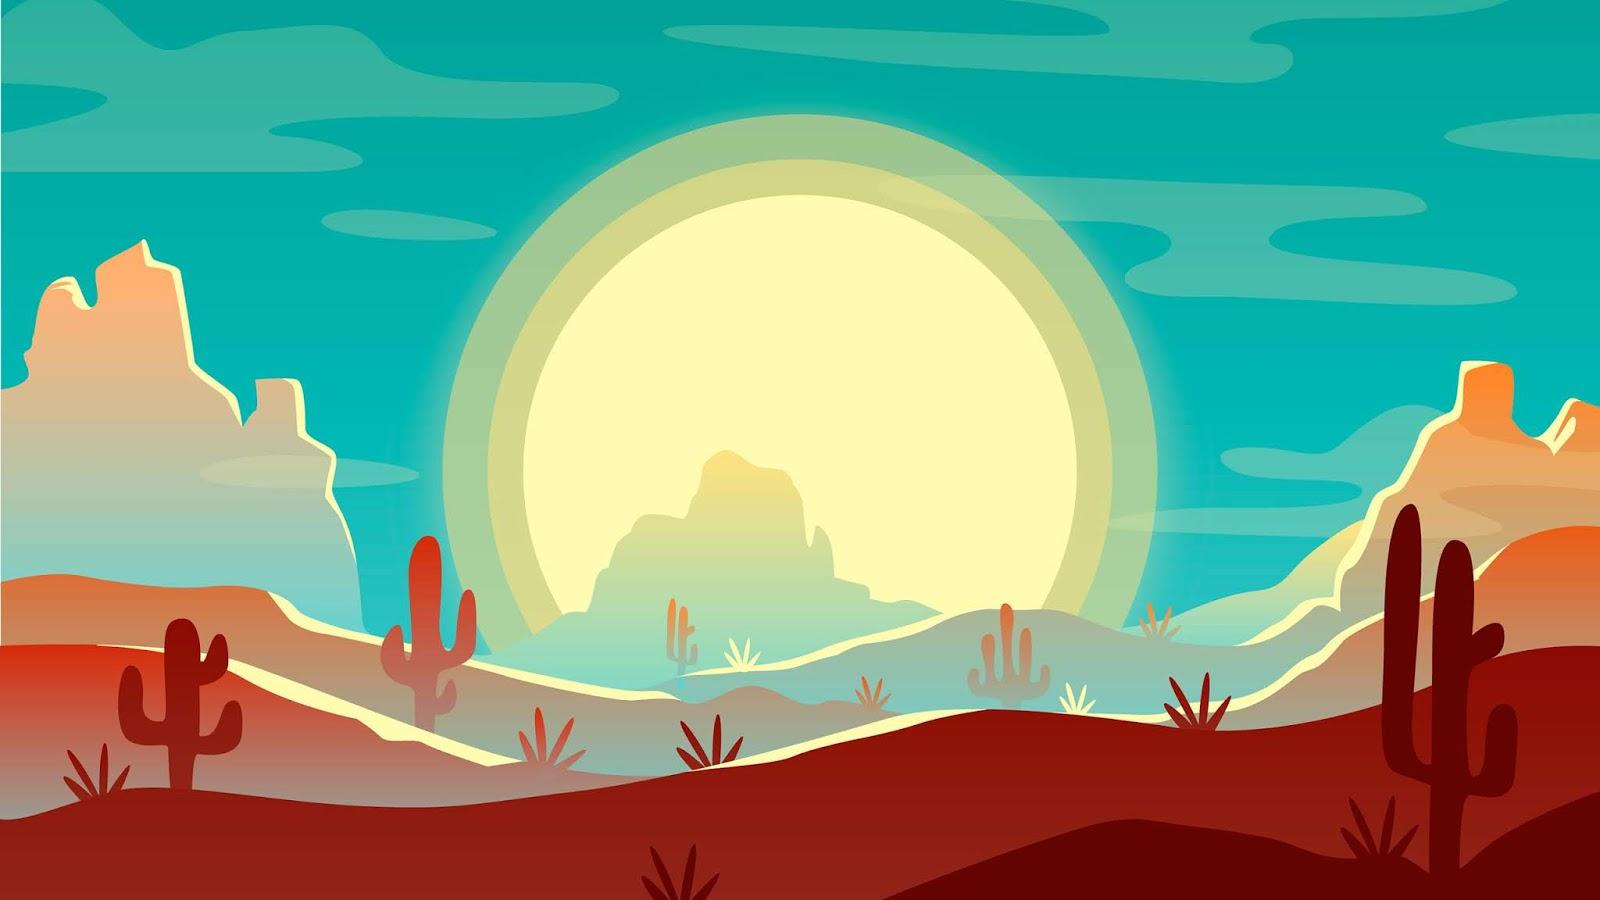 background minimalist 1440 pixels